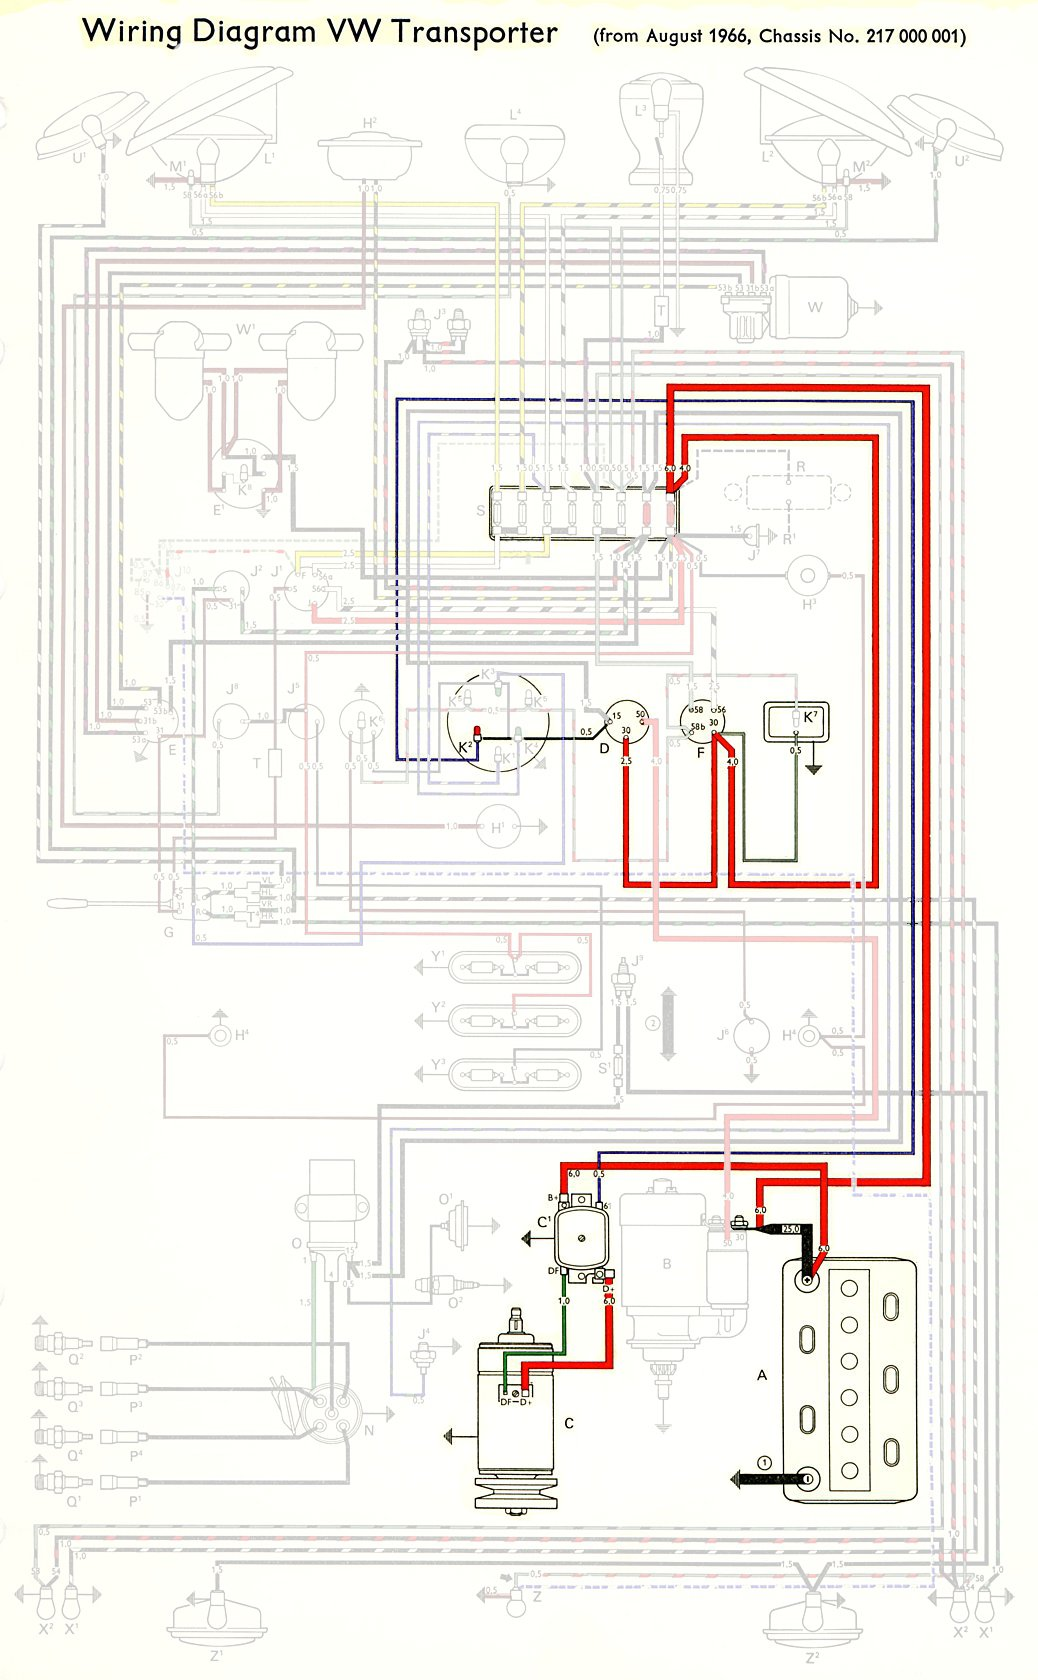 1967 volkswagen wiring diagram trane xe 900 air conditioner vw bug emergency flasher free engine